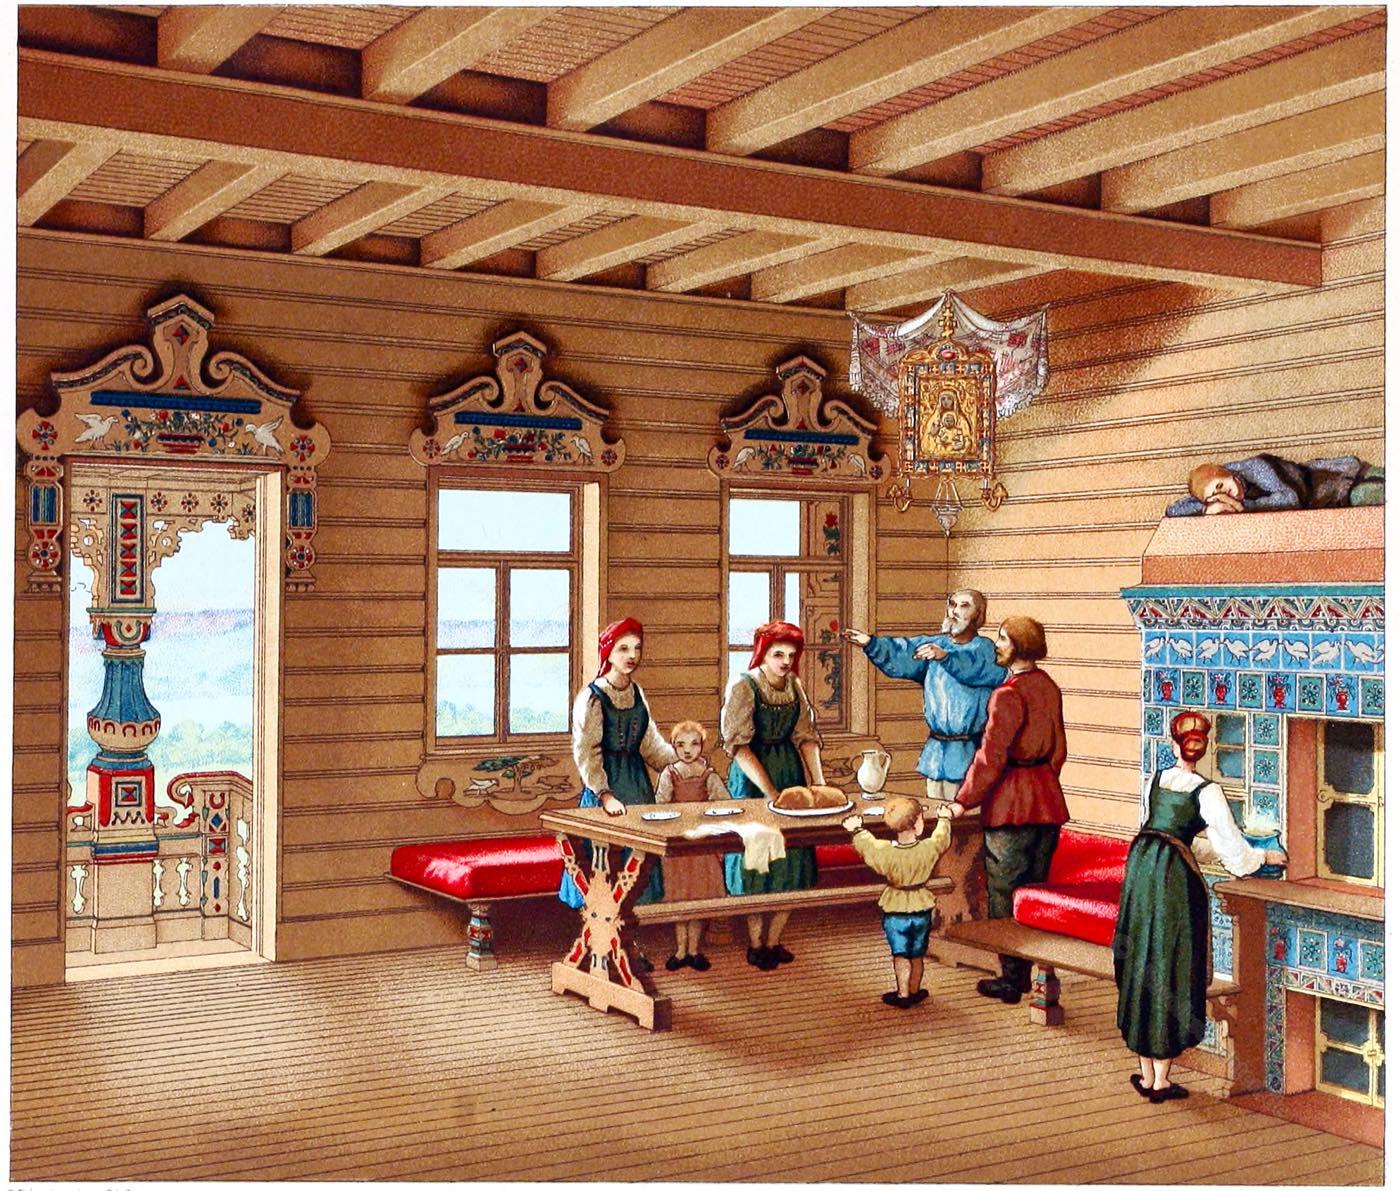 Russland, Izba, Wohnhaus, Holz-Landhaus, Muschik, Auguste Racinet, Haustypus,